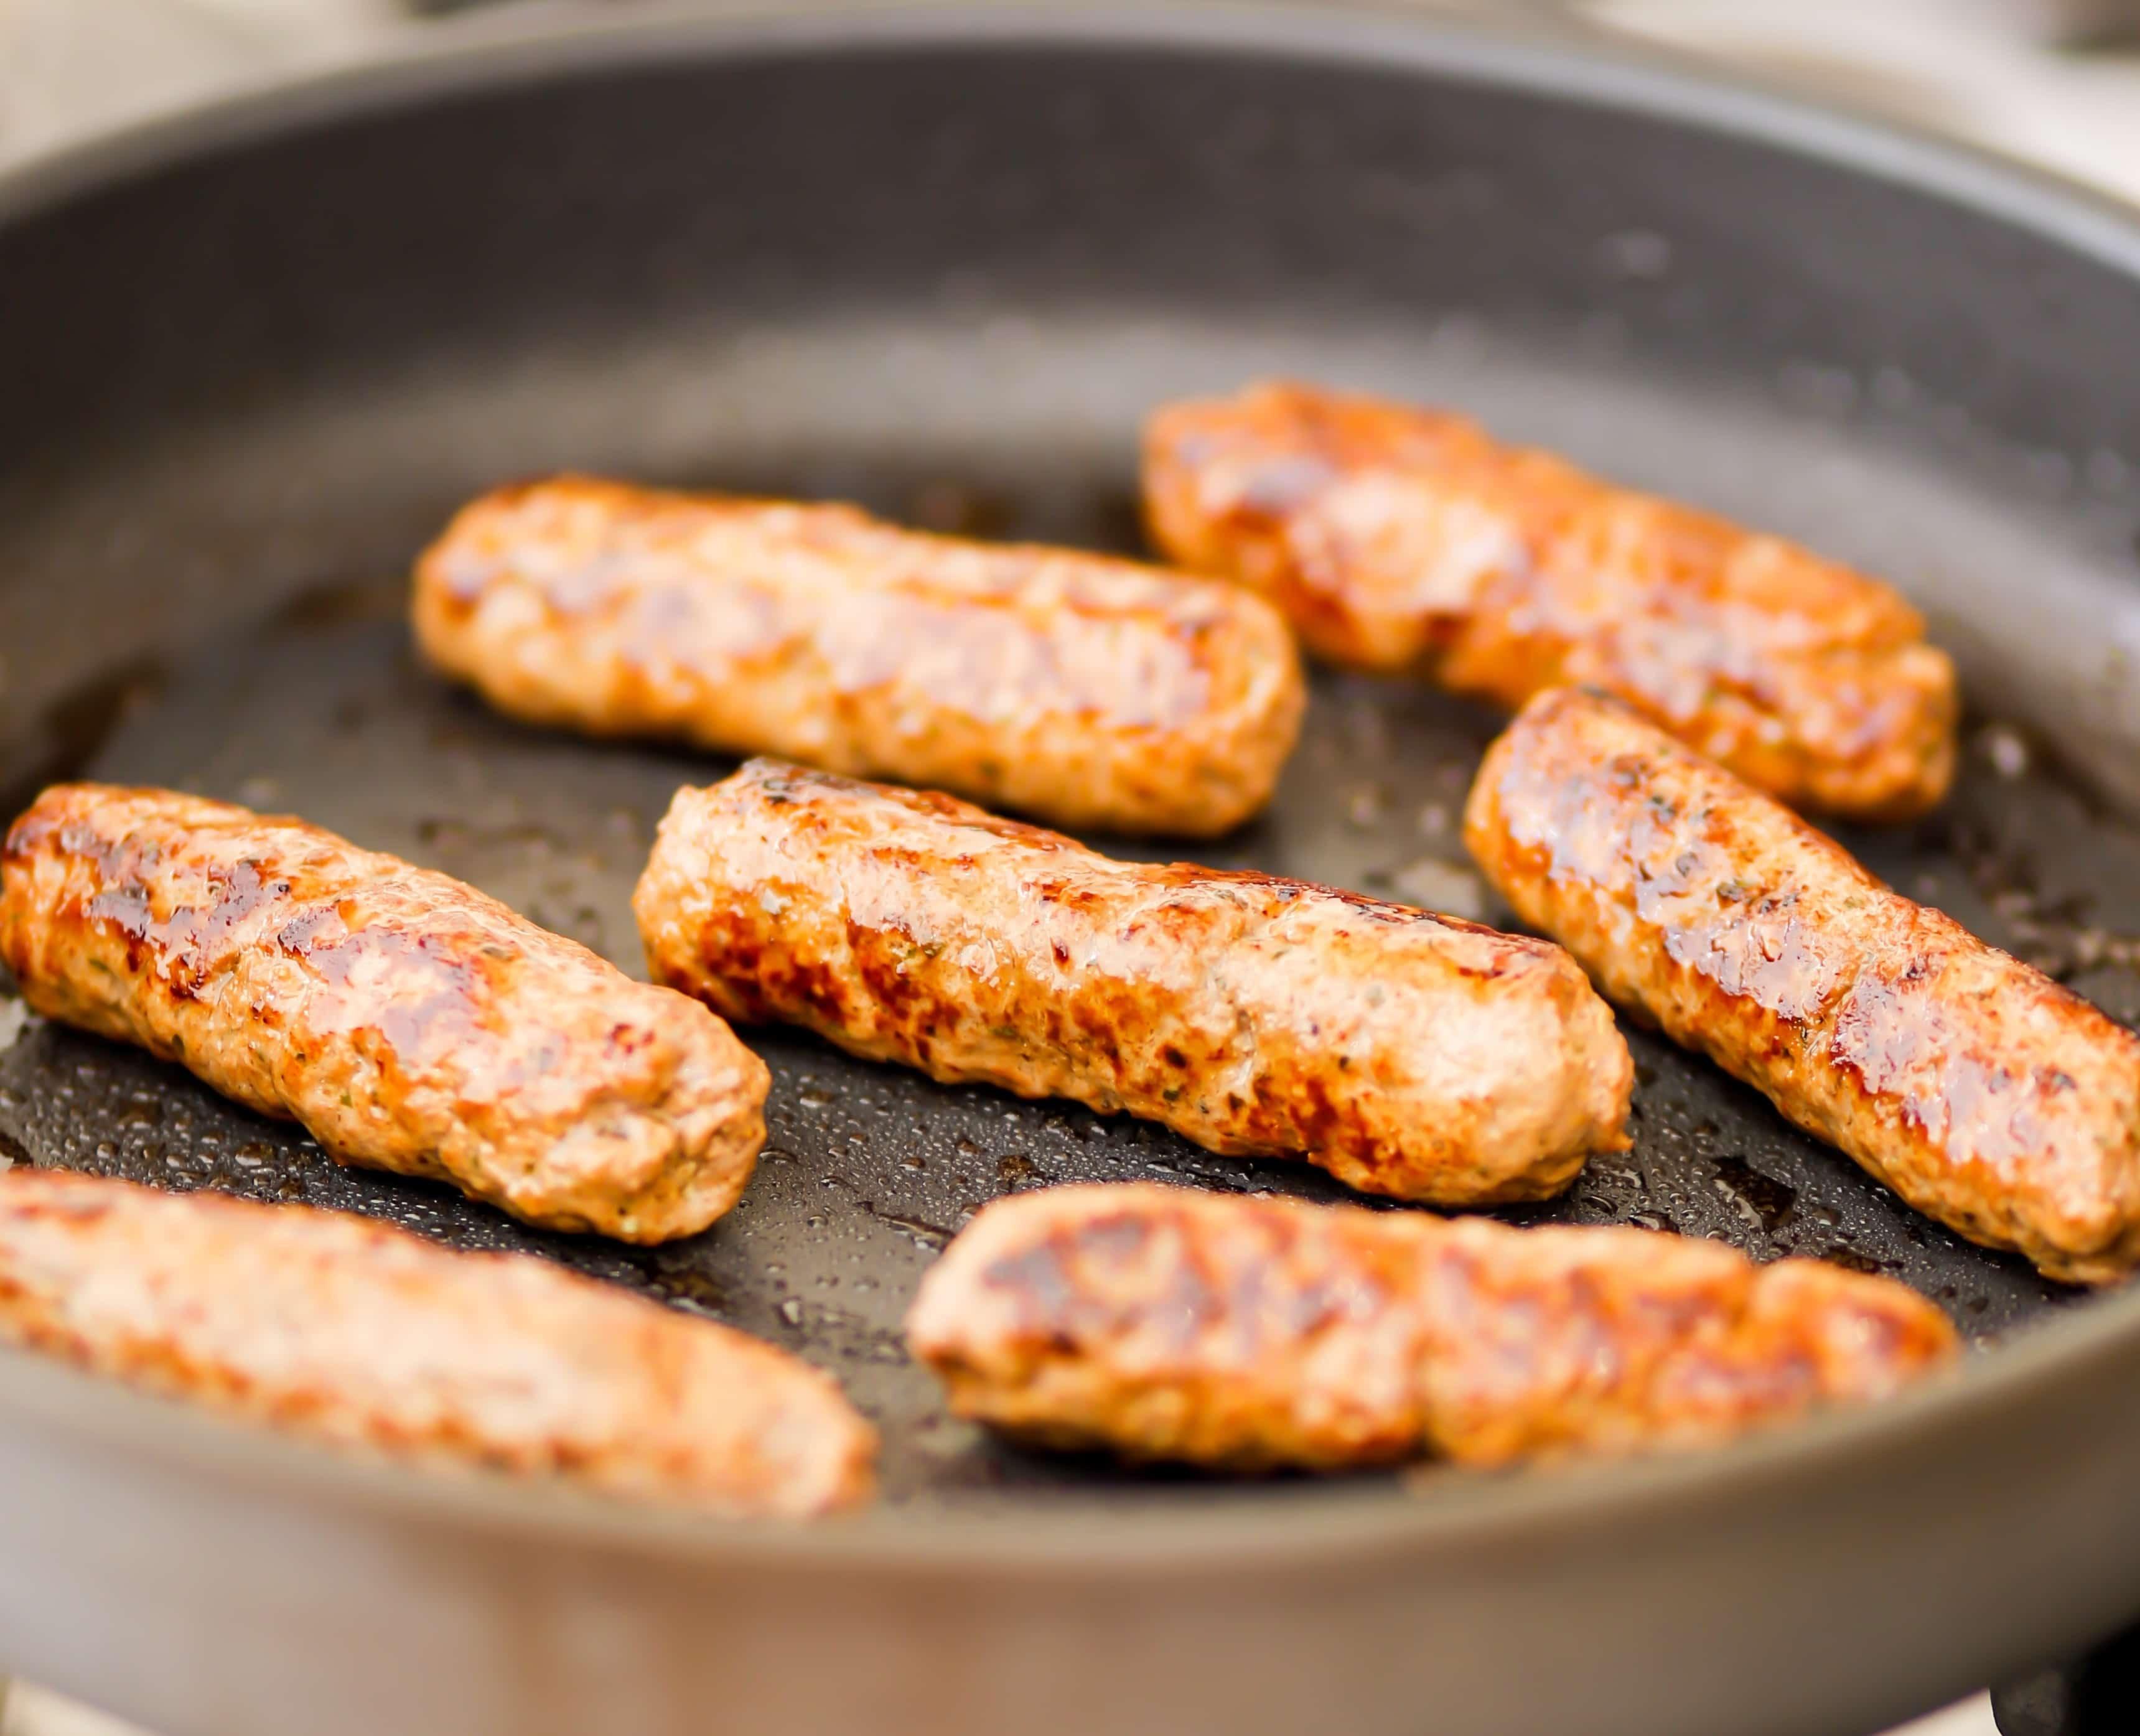 THMIII: Skinless Sausages - skinnymixers